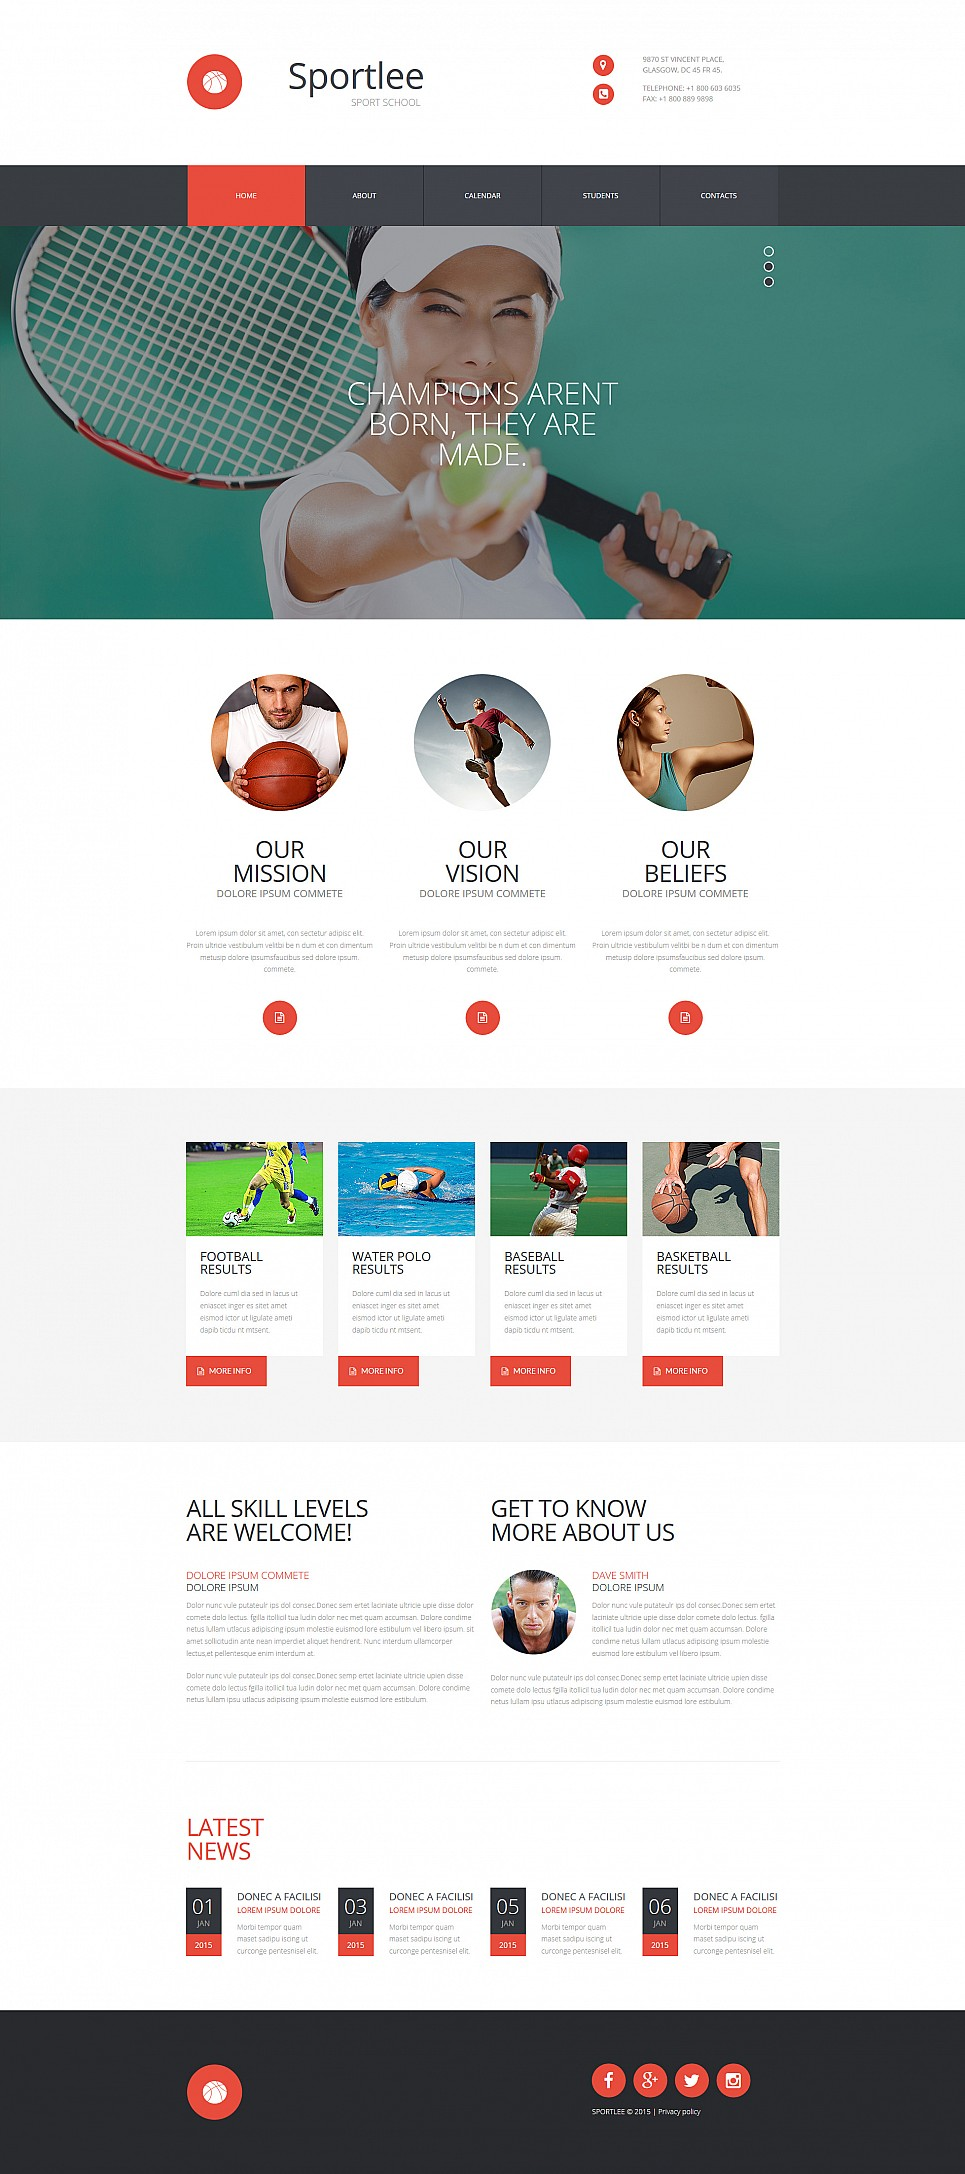 School Sports Website Template - image